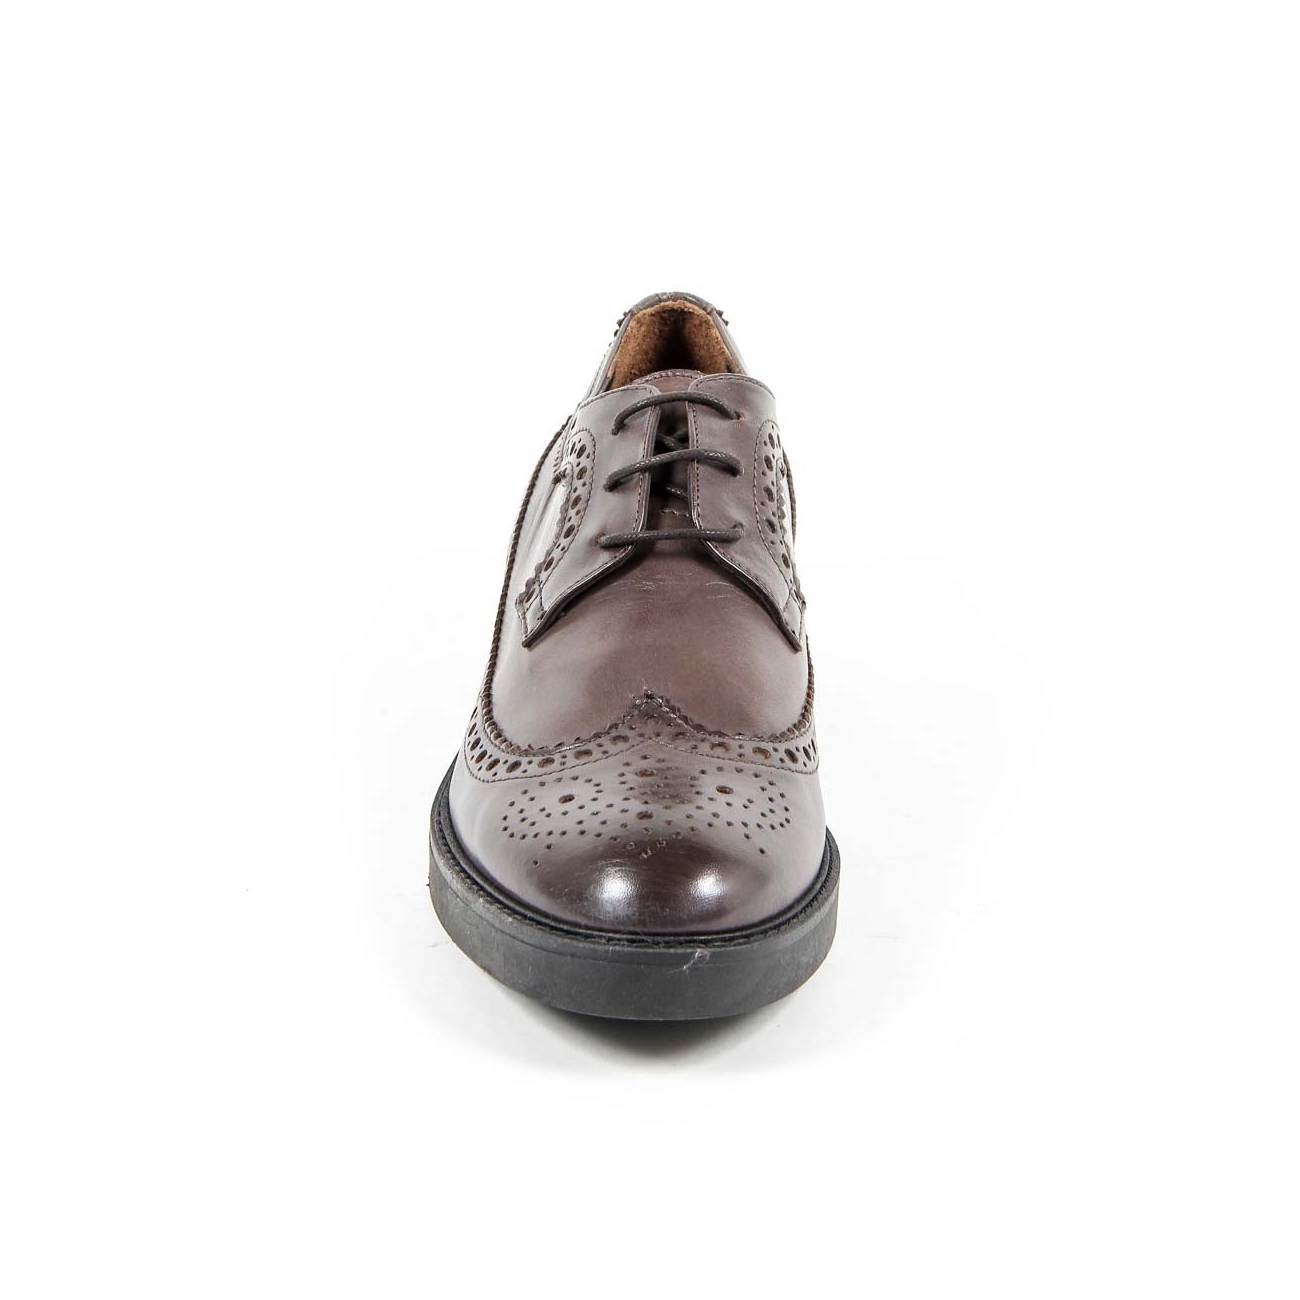 V 1969 Italia Women's Brogue Shoe B1670 VITELLO CEDAR